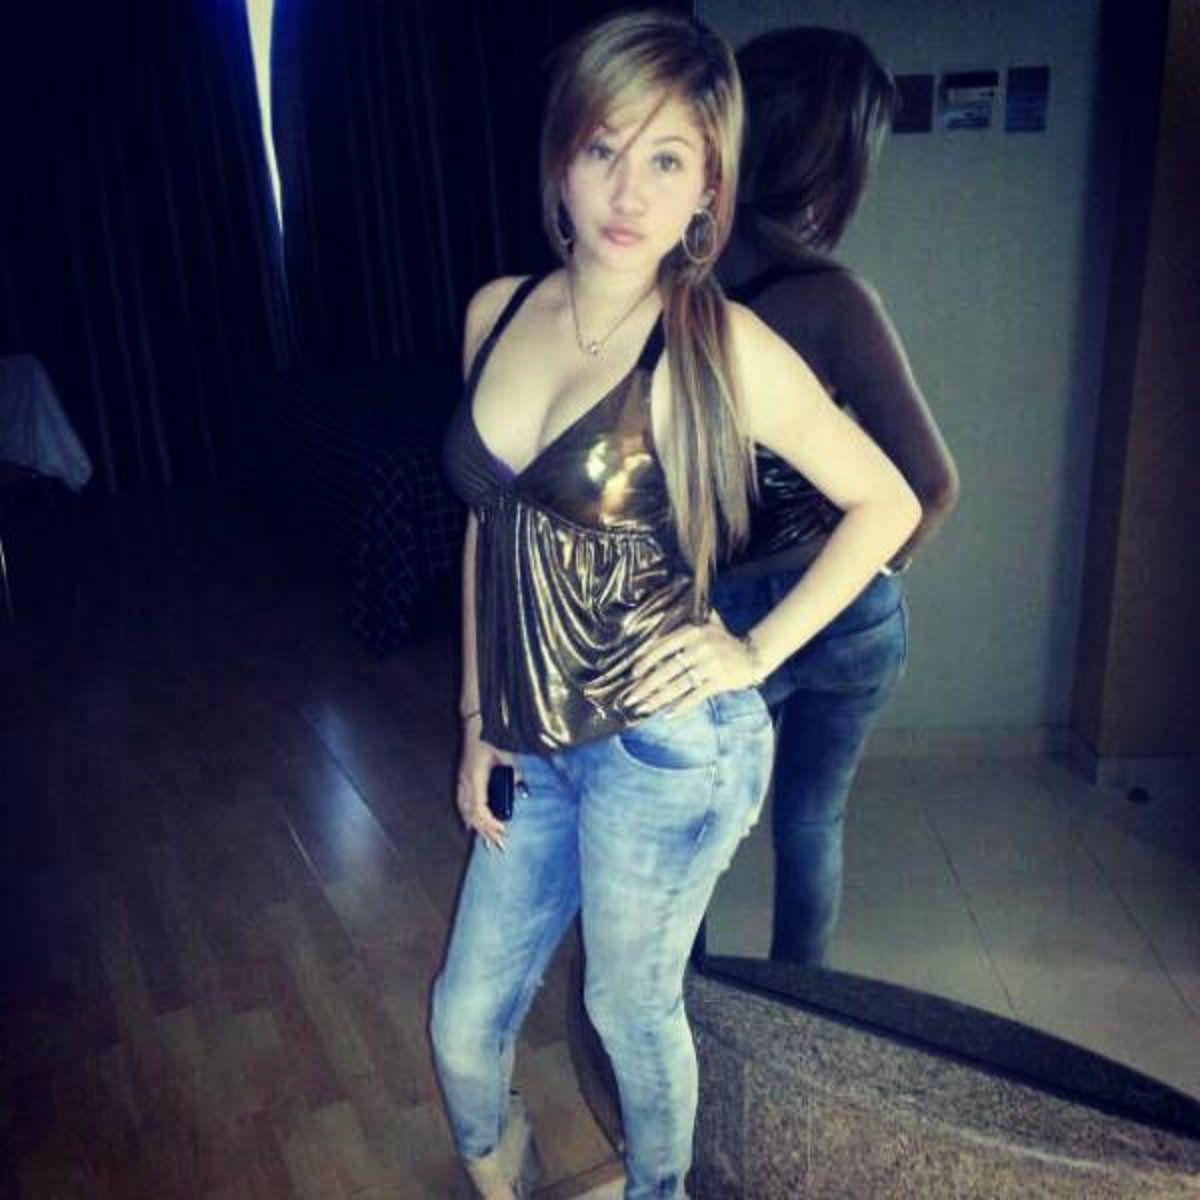 La joven venezolana desapareció tras una fiesta electrónica el 23 de febrero